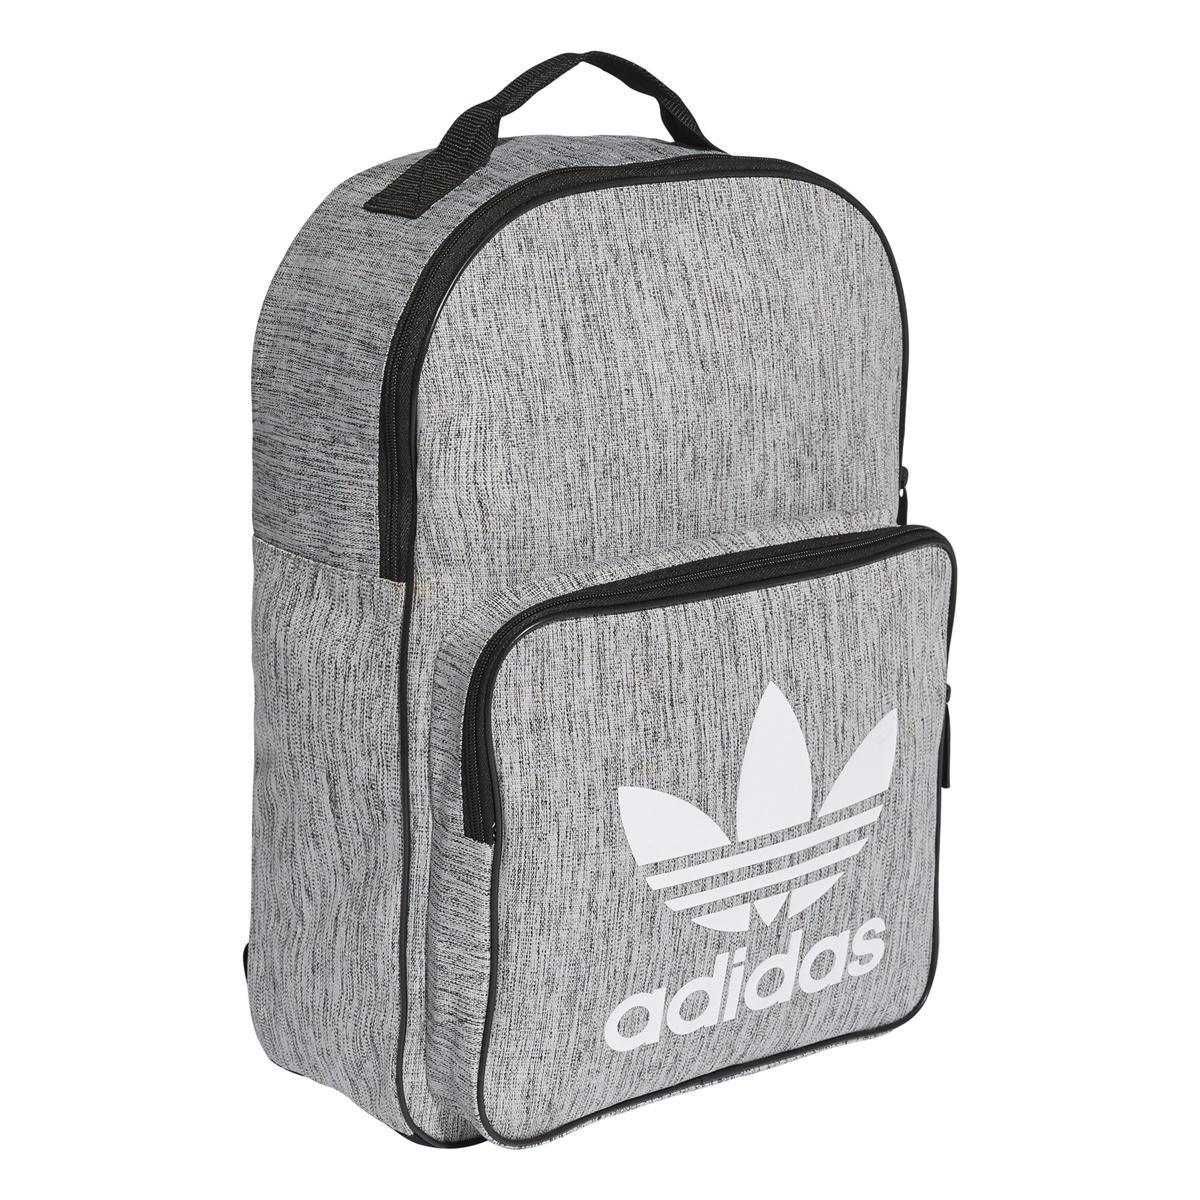 0ba4950b3 Adidas Originals Mochila Classic Casual Trefoil Grey